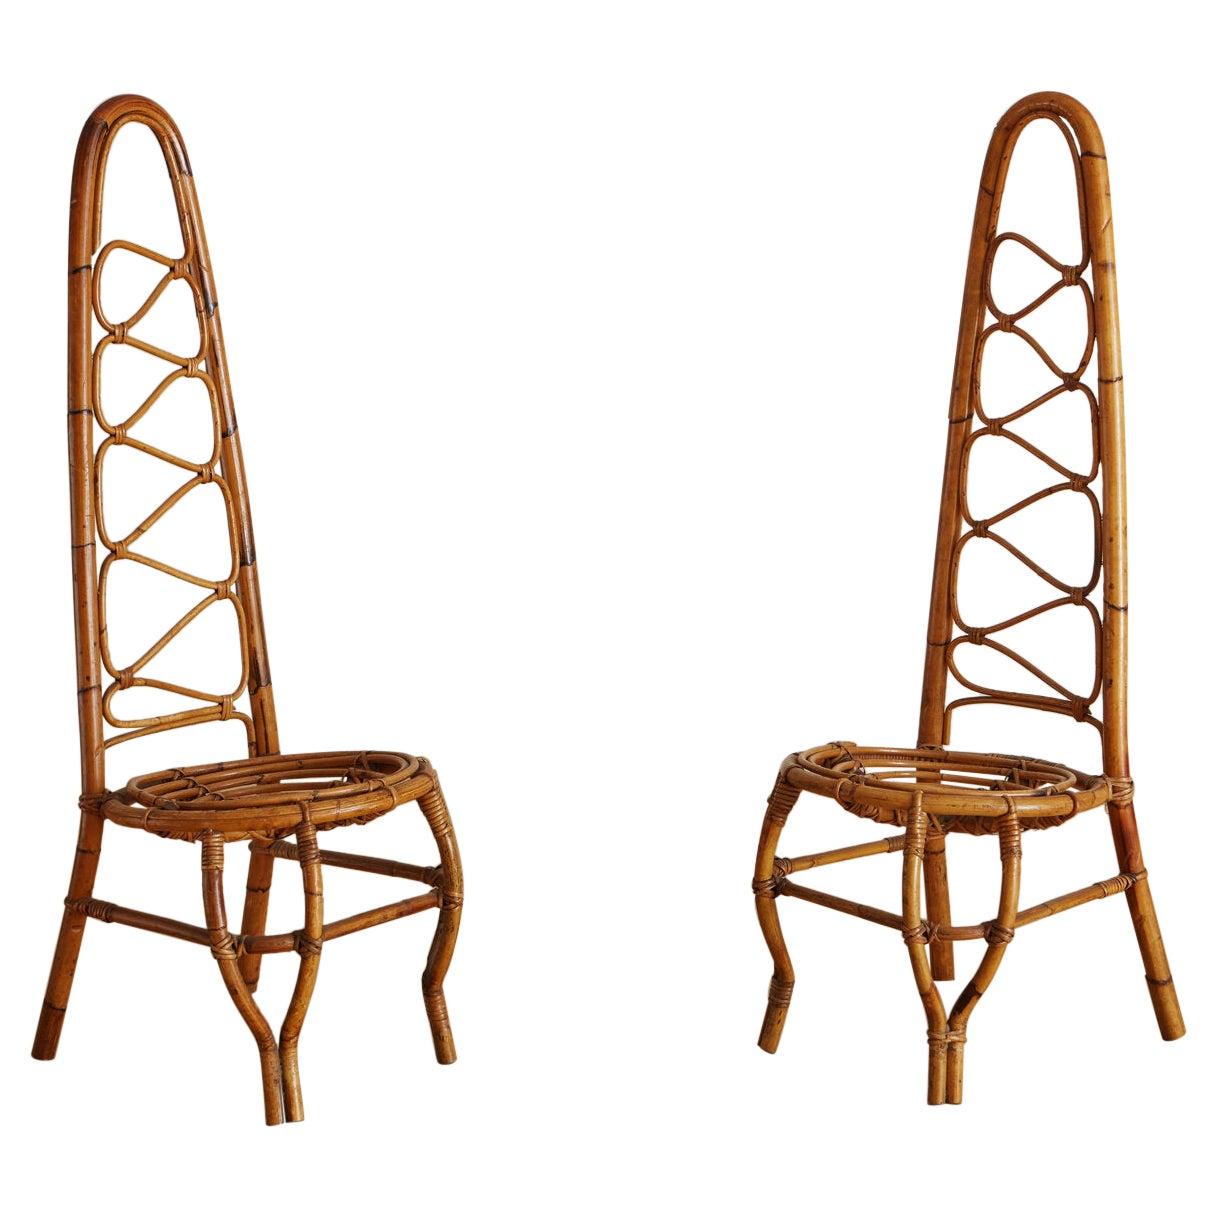 Pair of Italian Rattan Chairs, 1960s